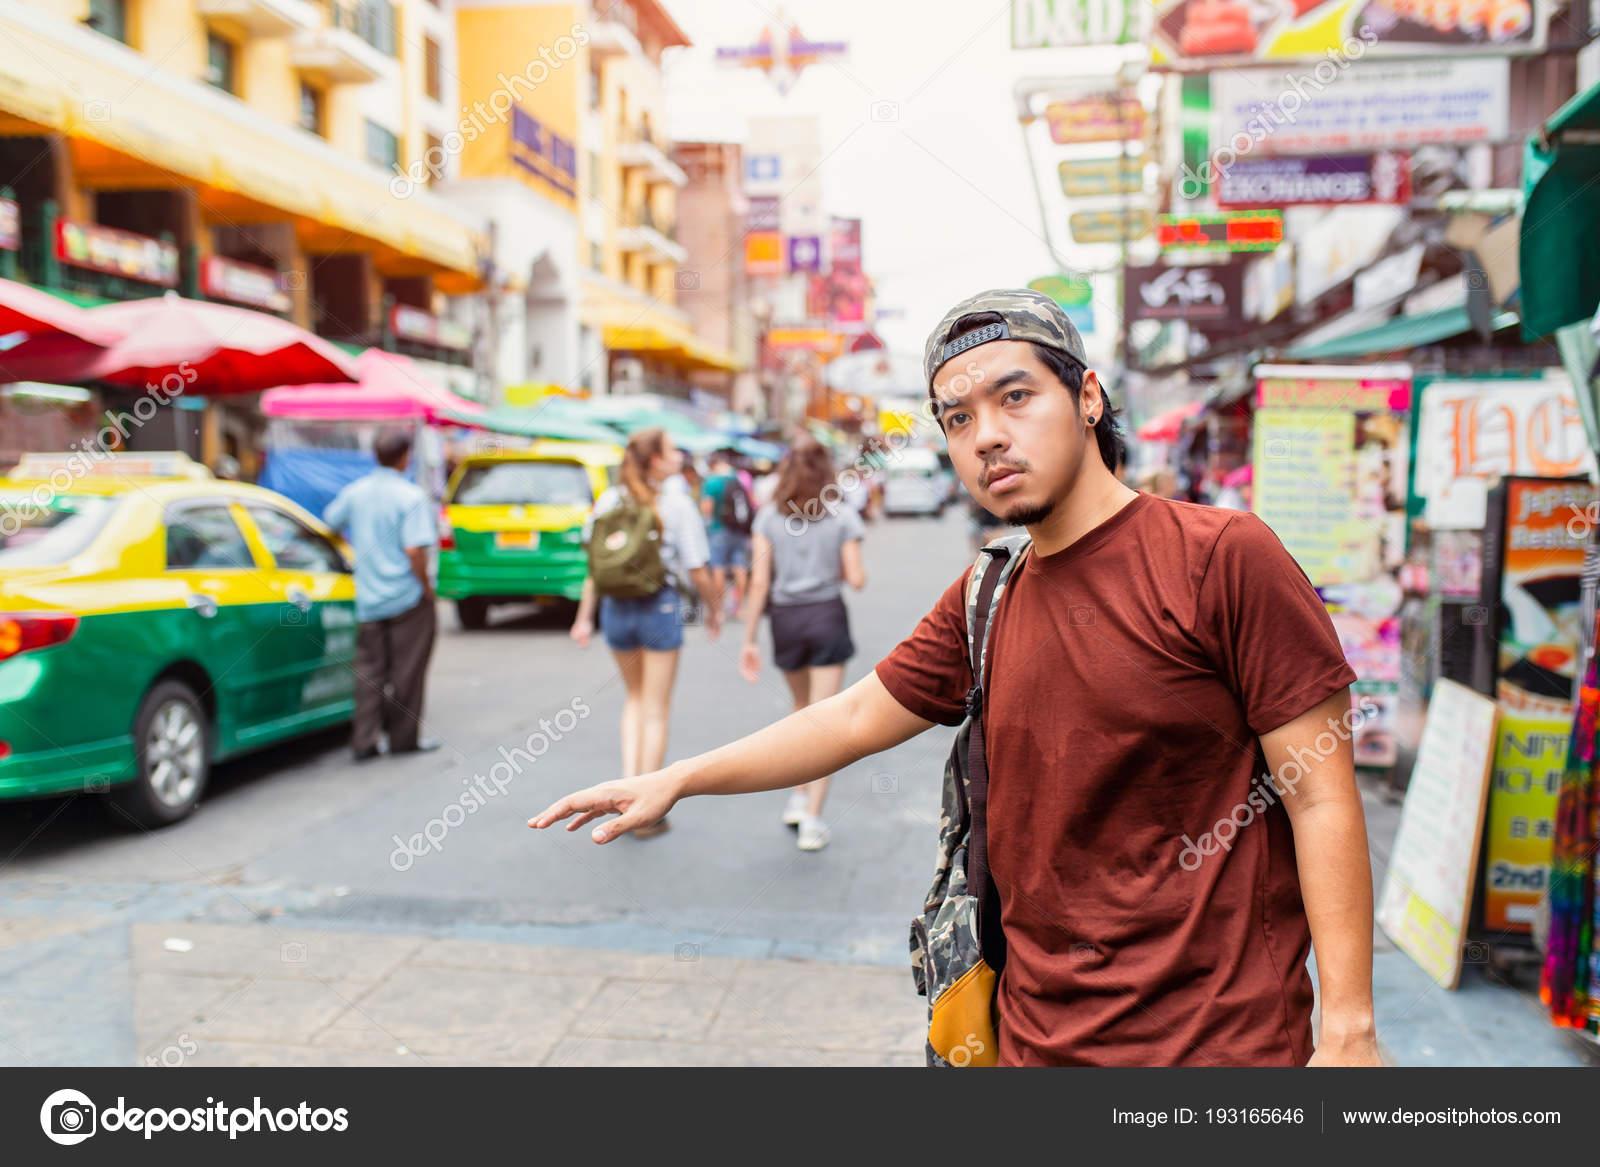 Image result for hailing a taxi bangkok